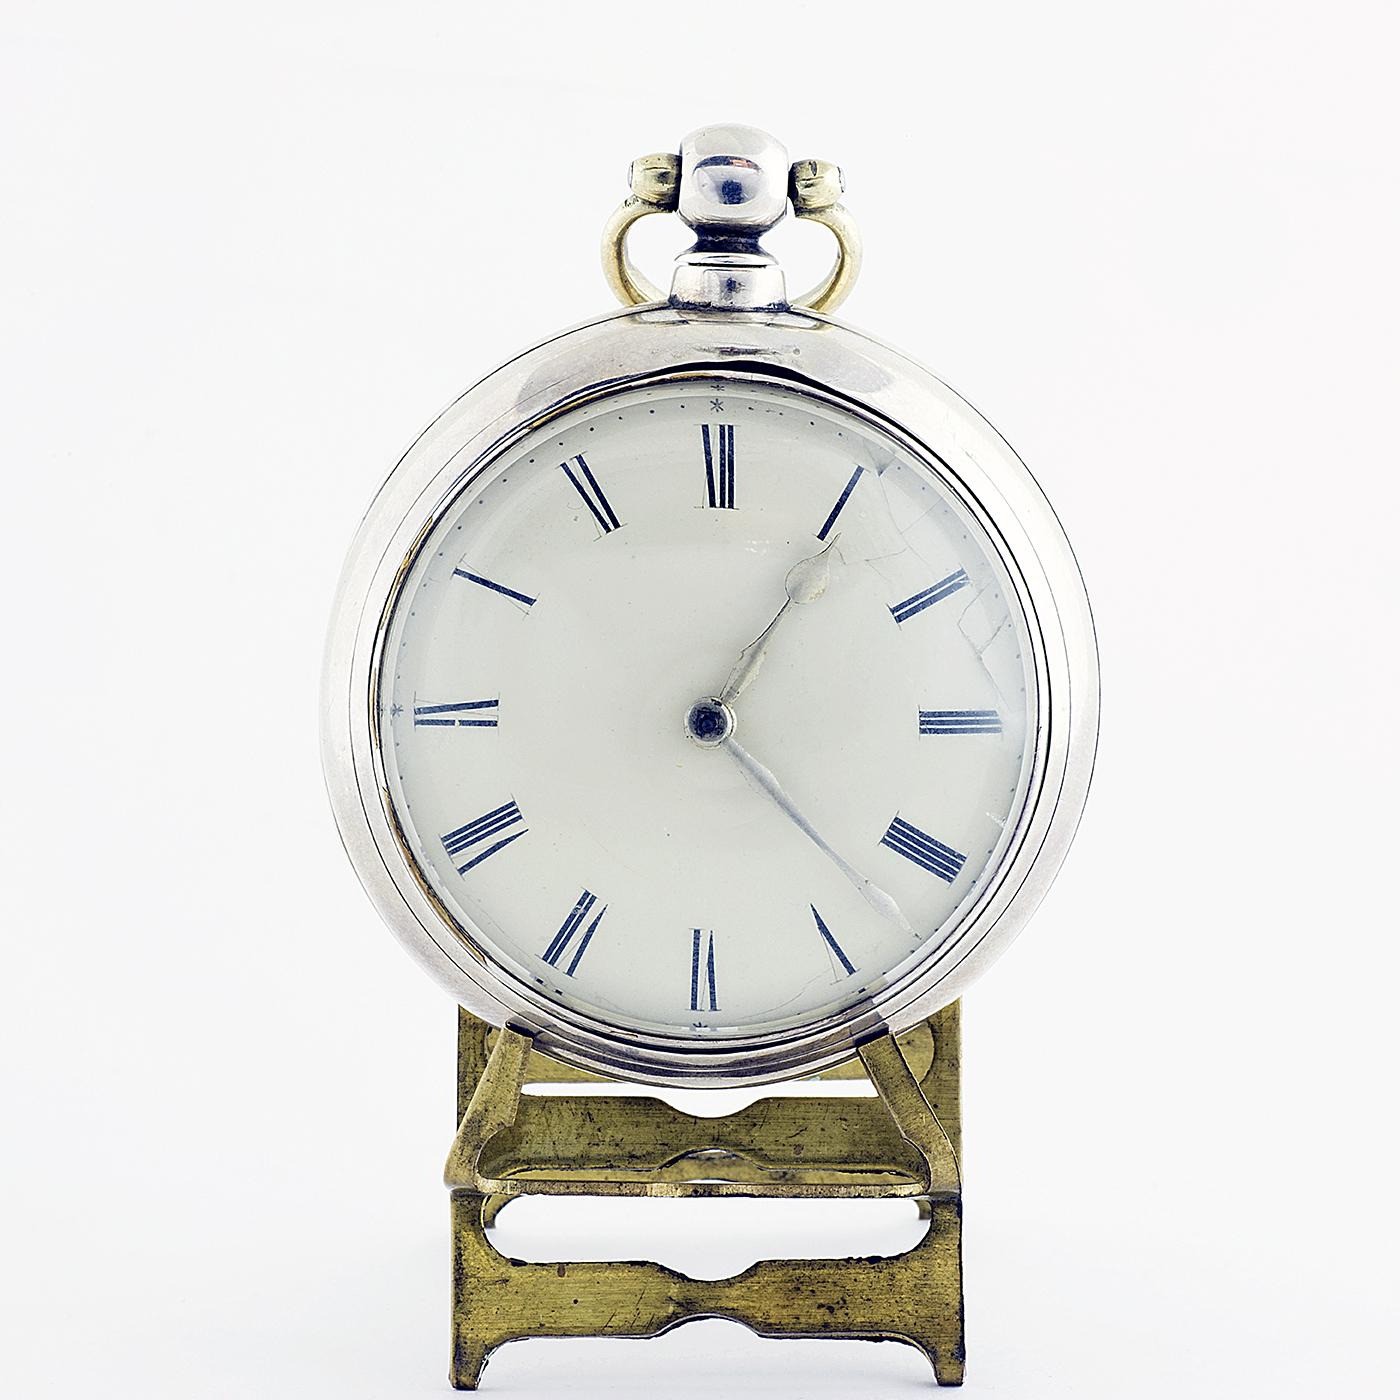 F. HILLYANL (London). Reloj de Bolsillo en PLata de Ley, para Caballero, Lepine, Verge Fuseé (catalino). Londres